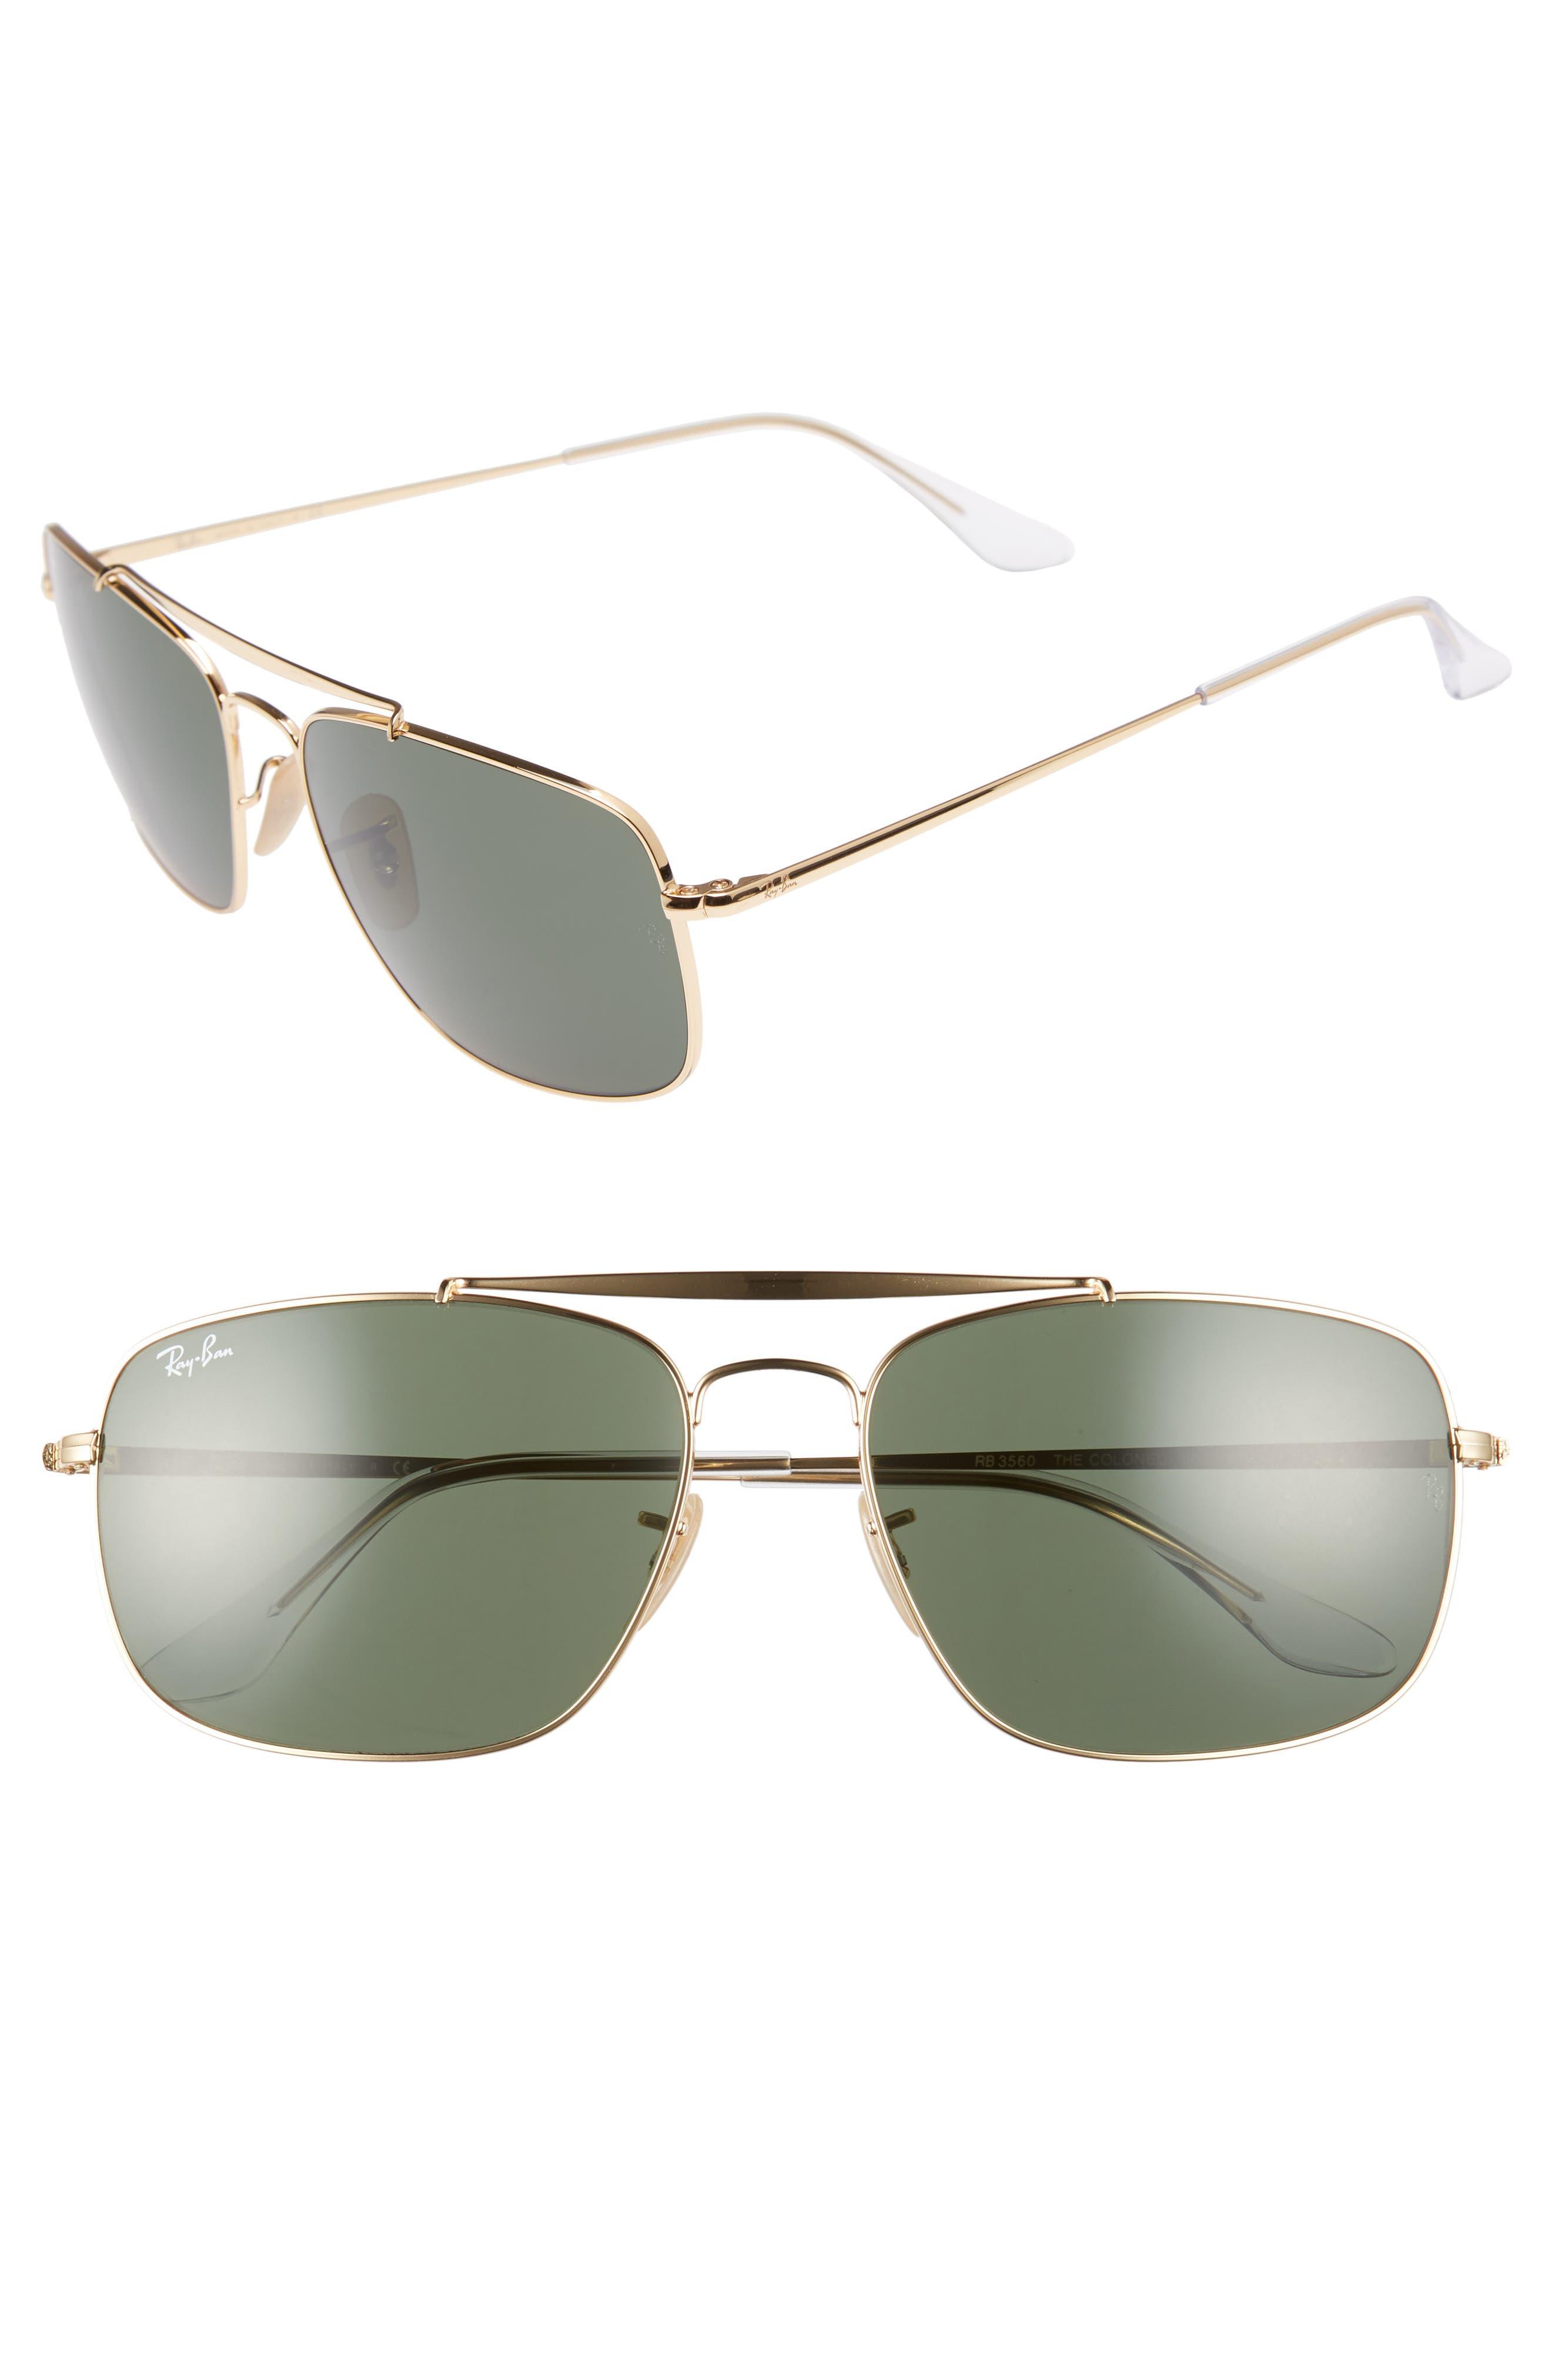 Ray-Ban The Colonel Square 61Mm Sunglasses - Gold